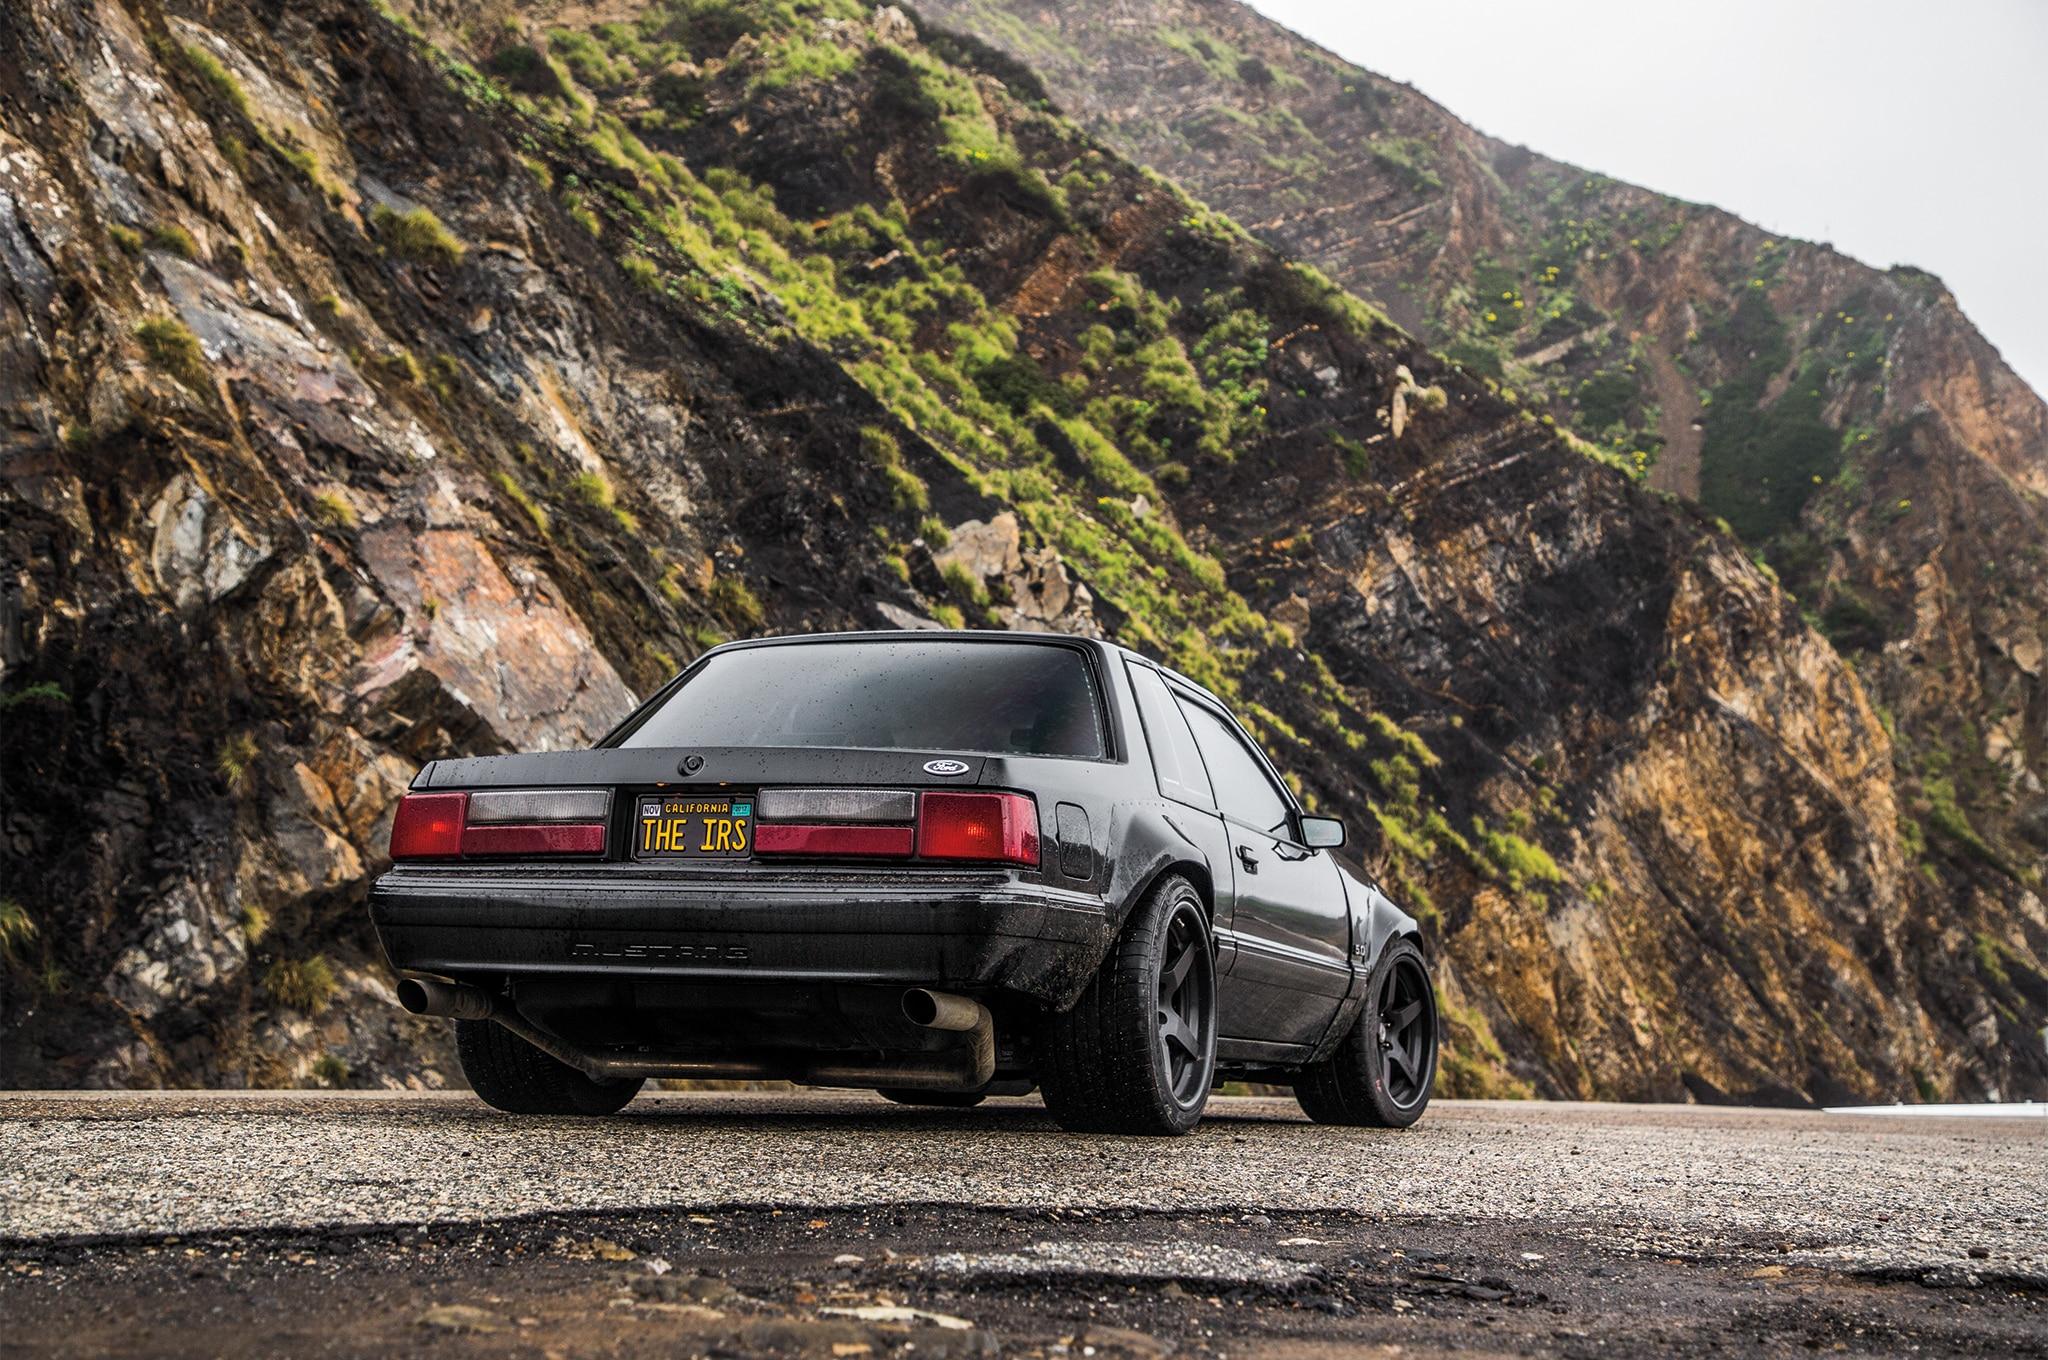 1988 Ford Mustang LX 5 0 SSP Rear Three Quarter